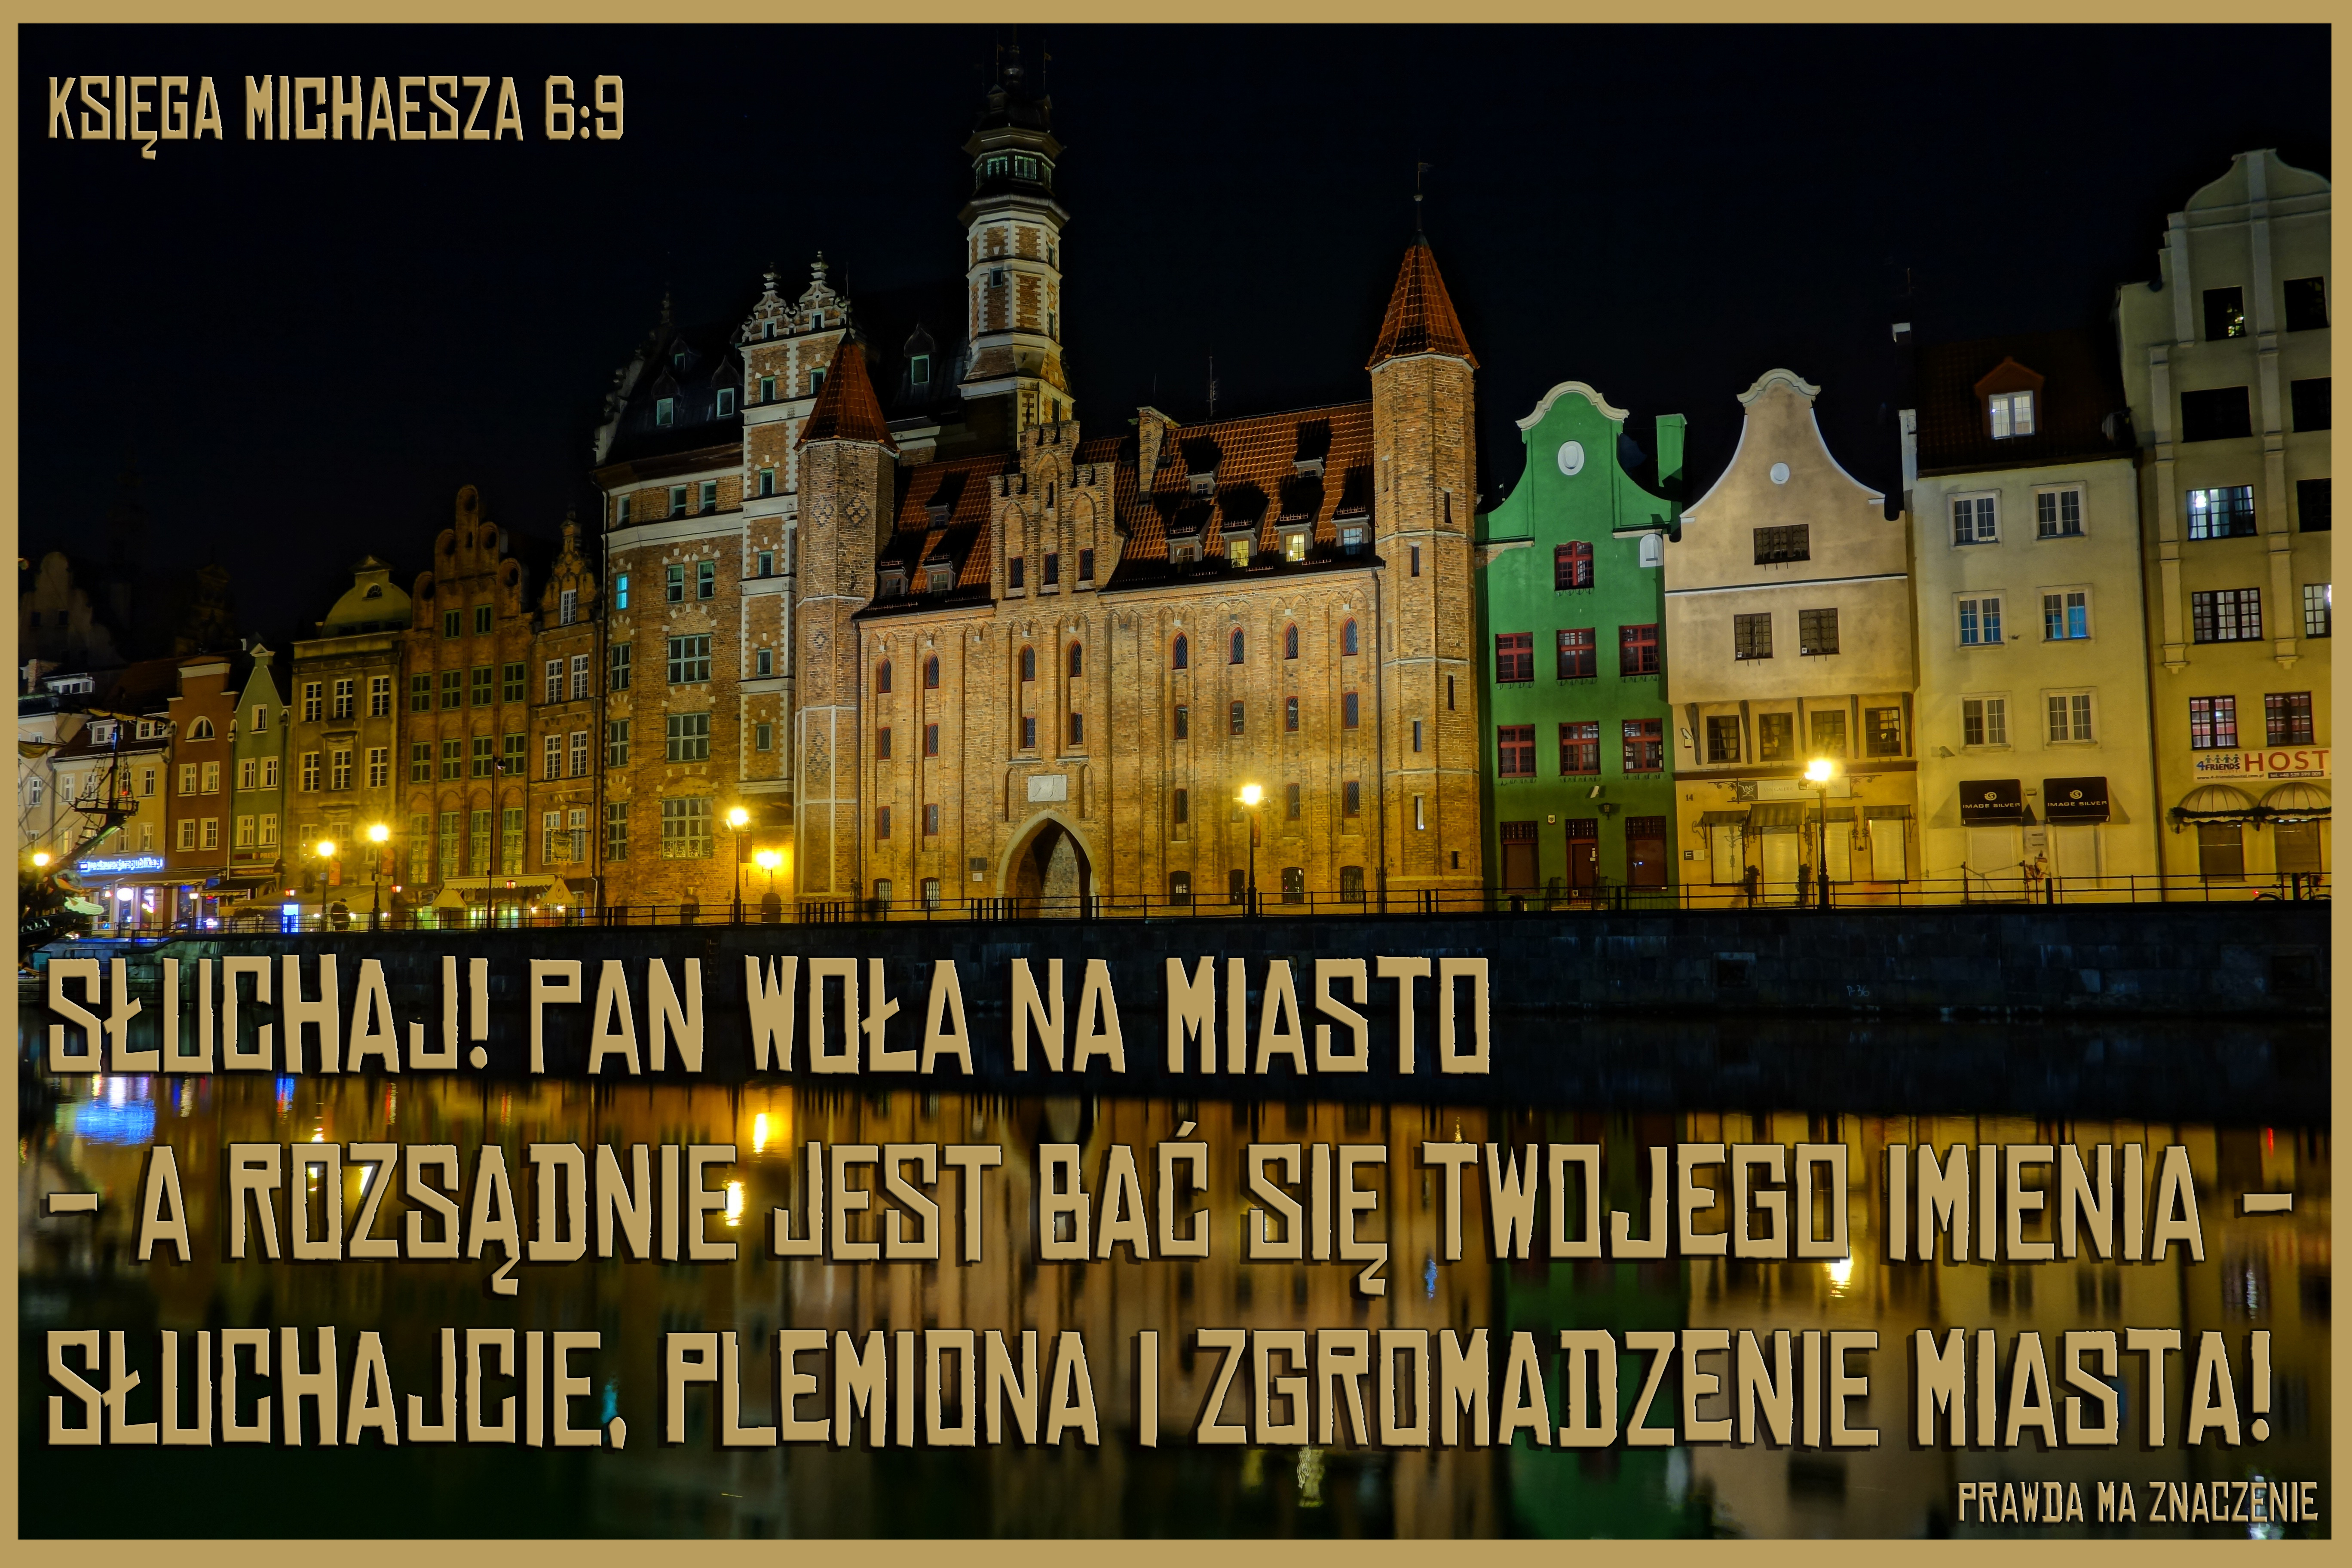 księga_michaesza_6_9